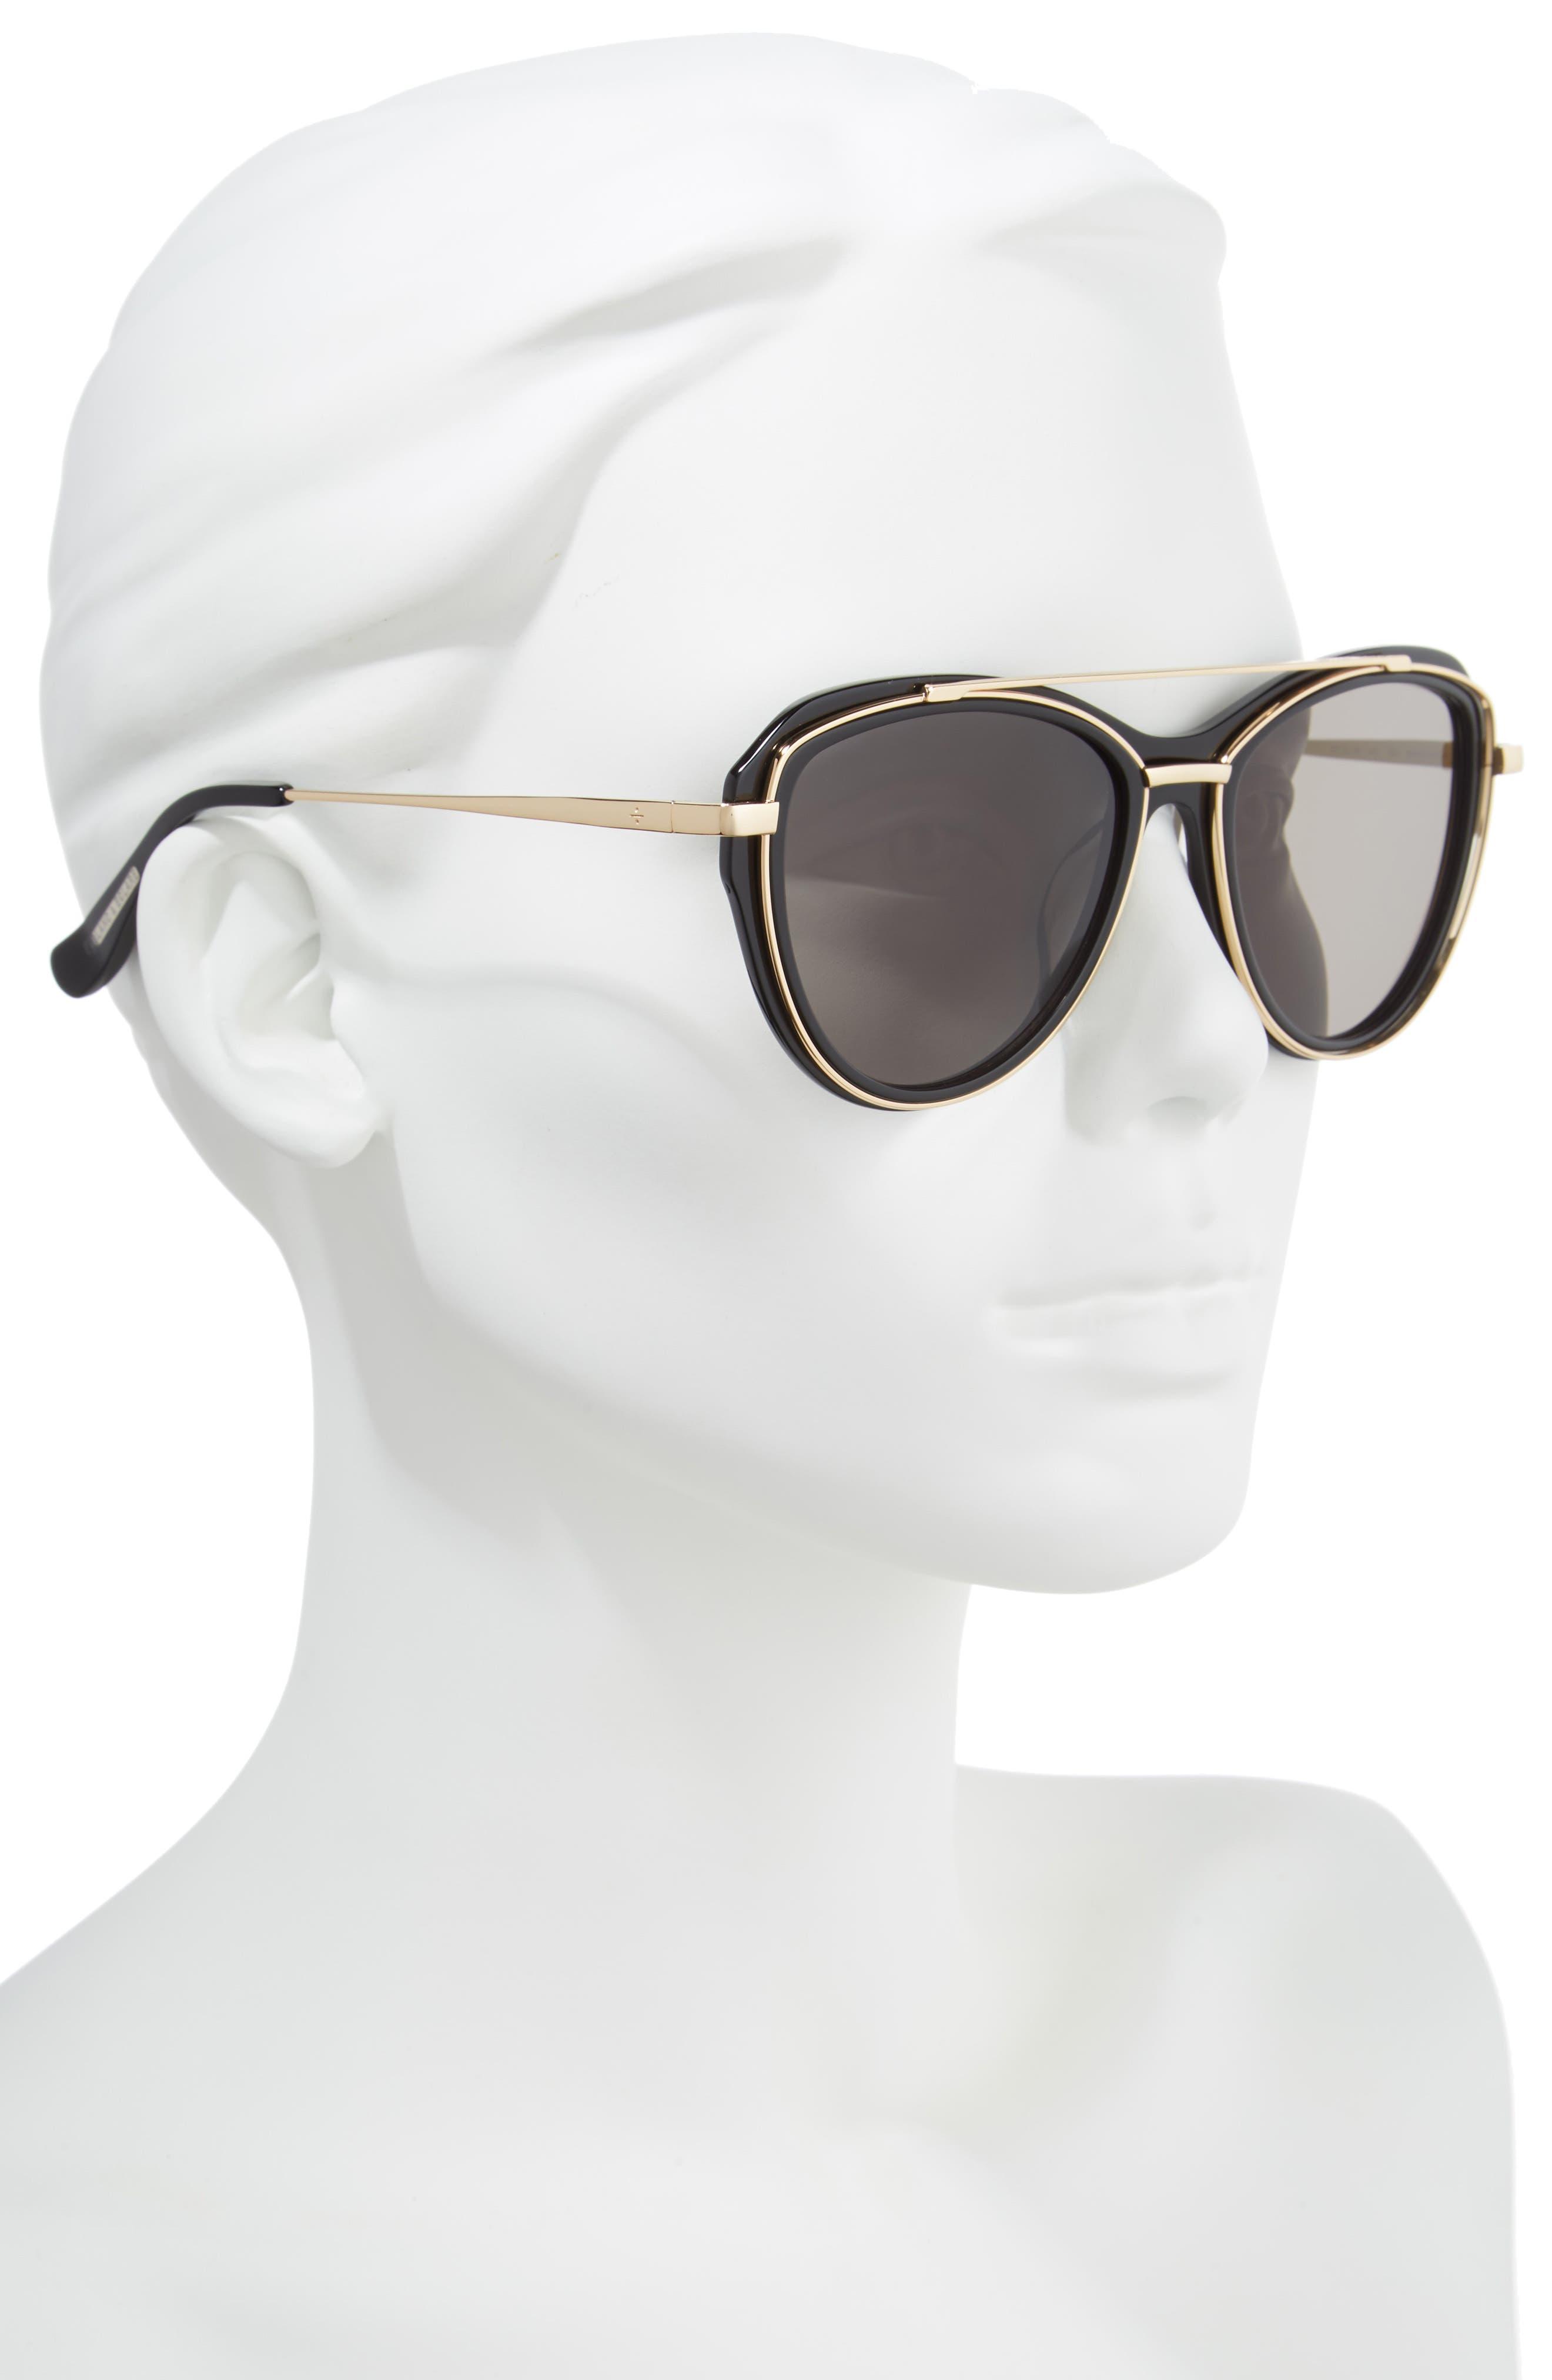 BLANC & ECLARE Marrakesh 57mm Aviator Sunglasses,                             Alternate thumbnail 2, color,                             Black/ Gold/ Smog Grey